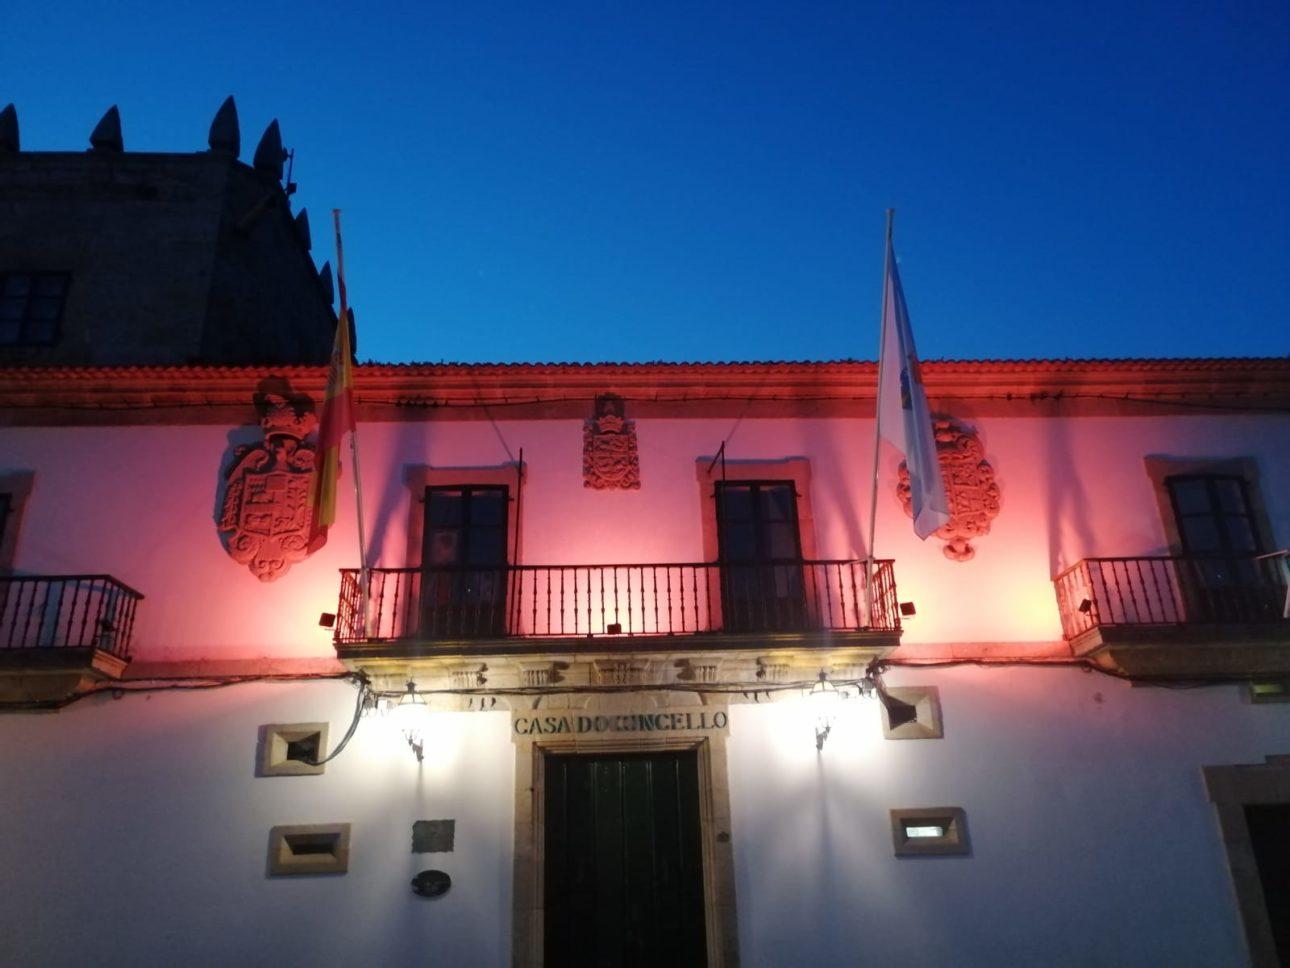 Fachada Concello de Baiona iluminada naranja scaled Baiona